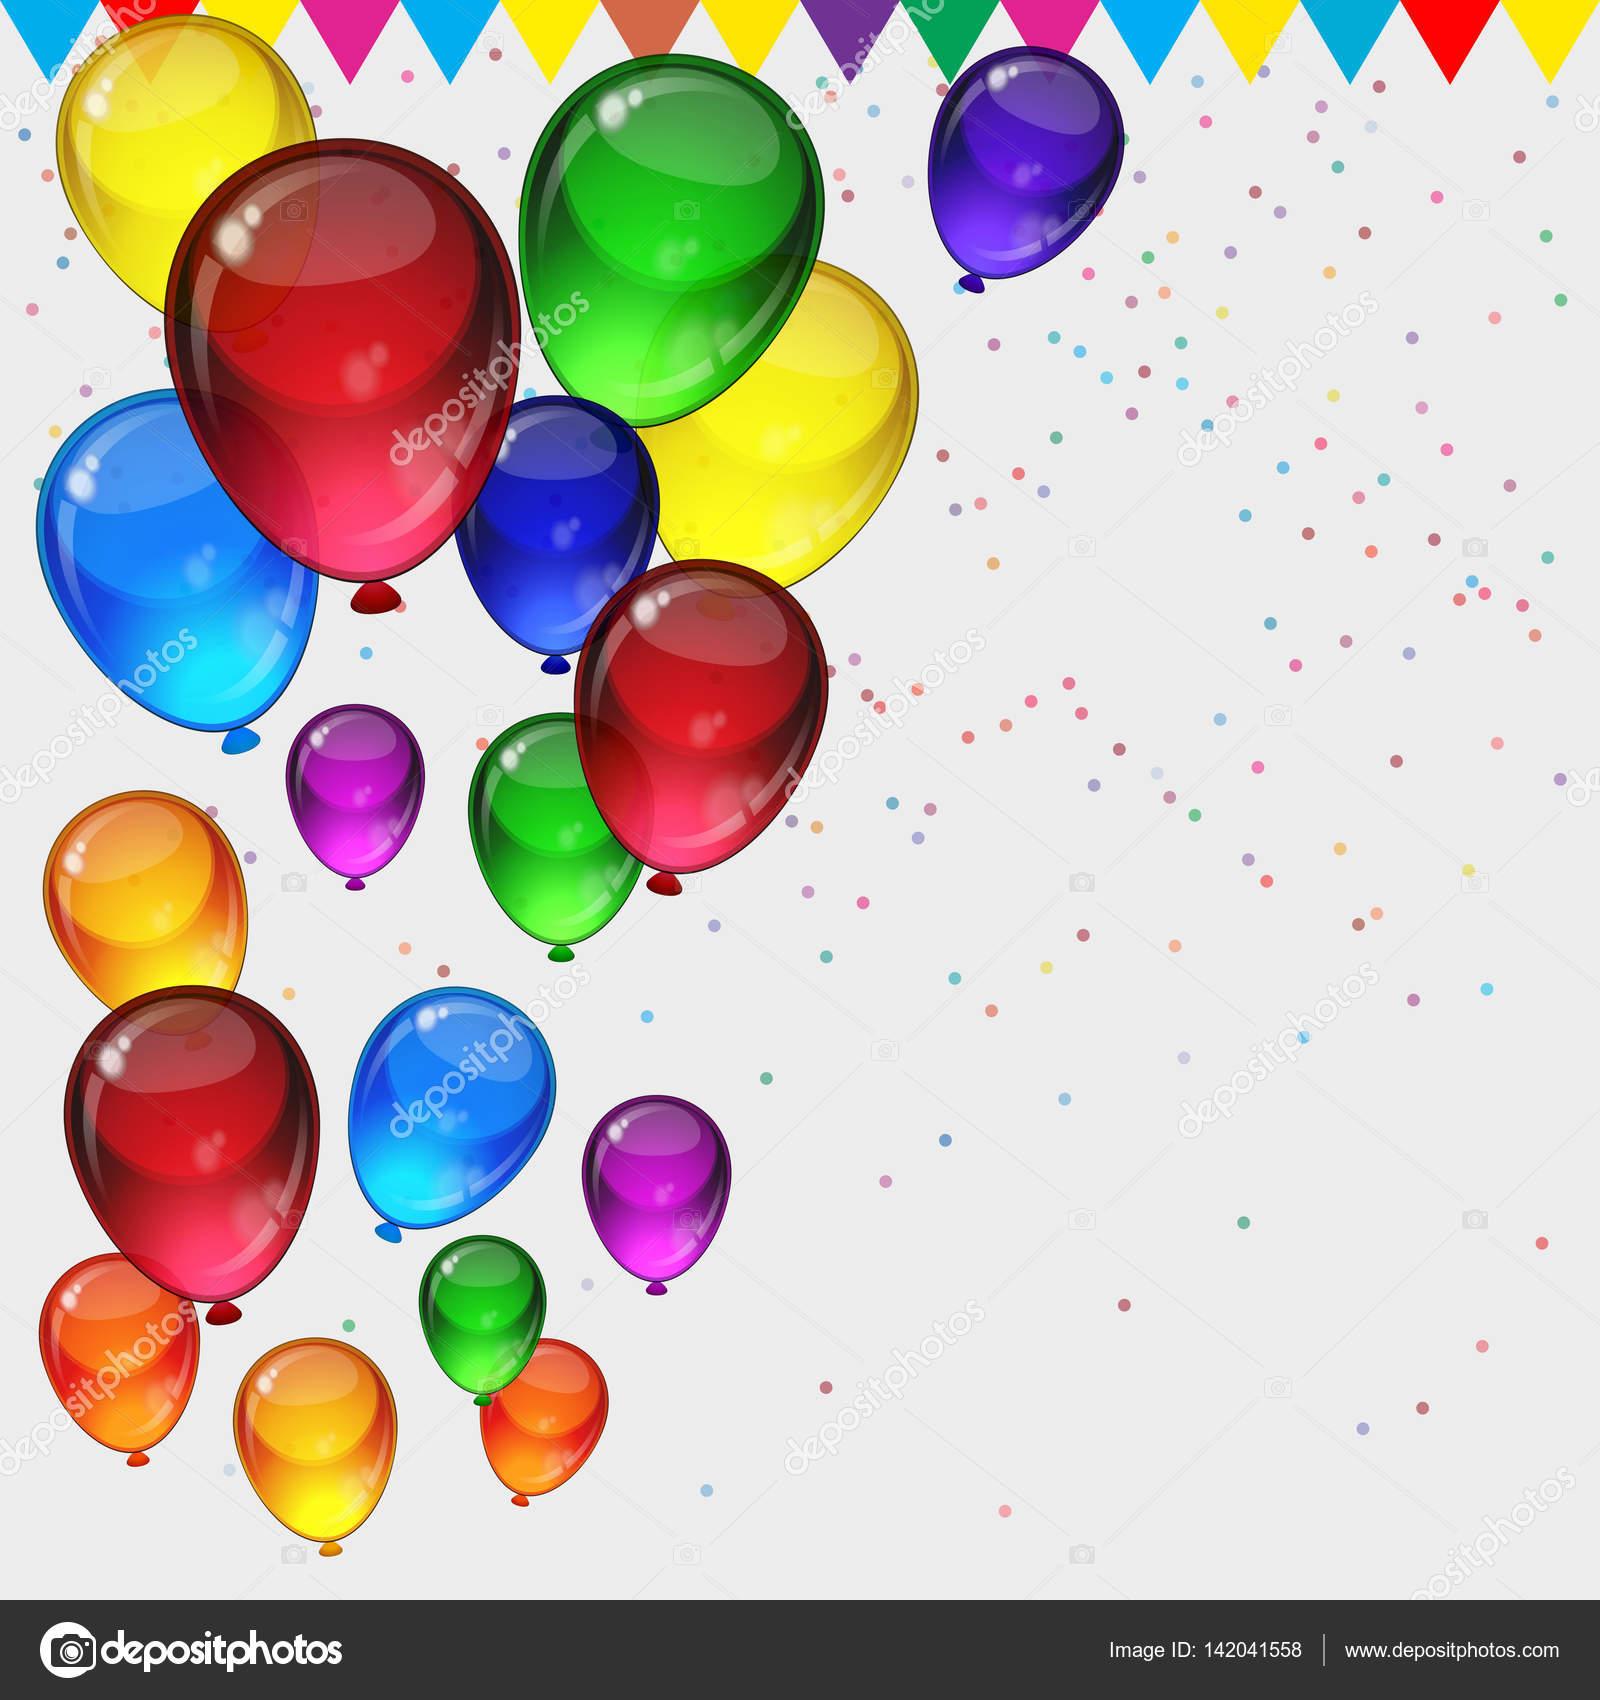 Fondo de fiesta cumplea os globos fiestas coloridos - Globos fiesta cumpleanos ...